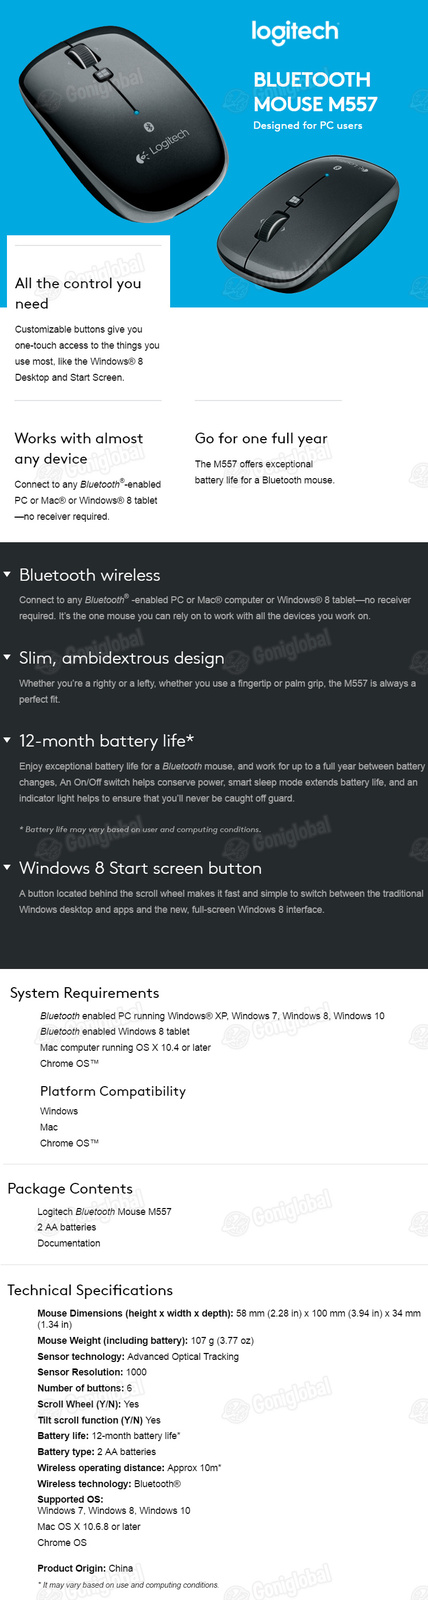 Logitech Logitech Wireless Bluetooth Gaming Mouse M557 Pearl White / Win 8 Start